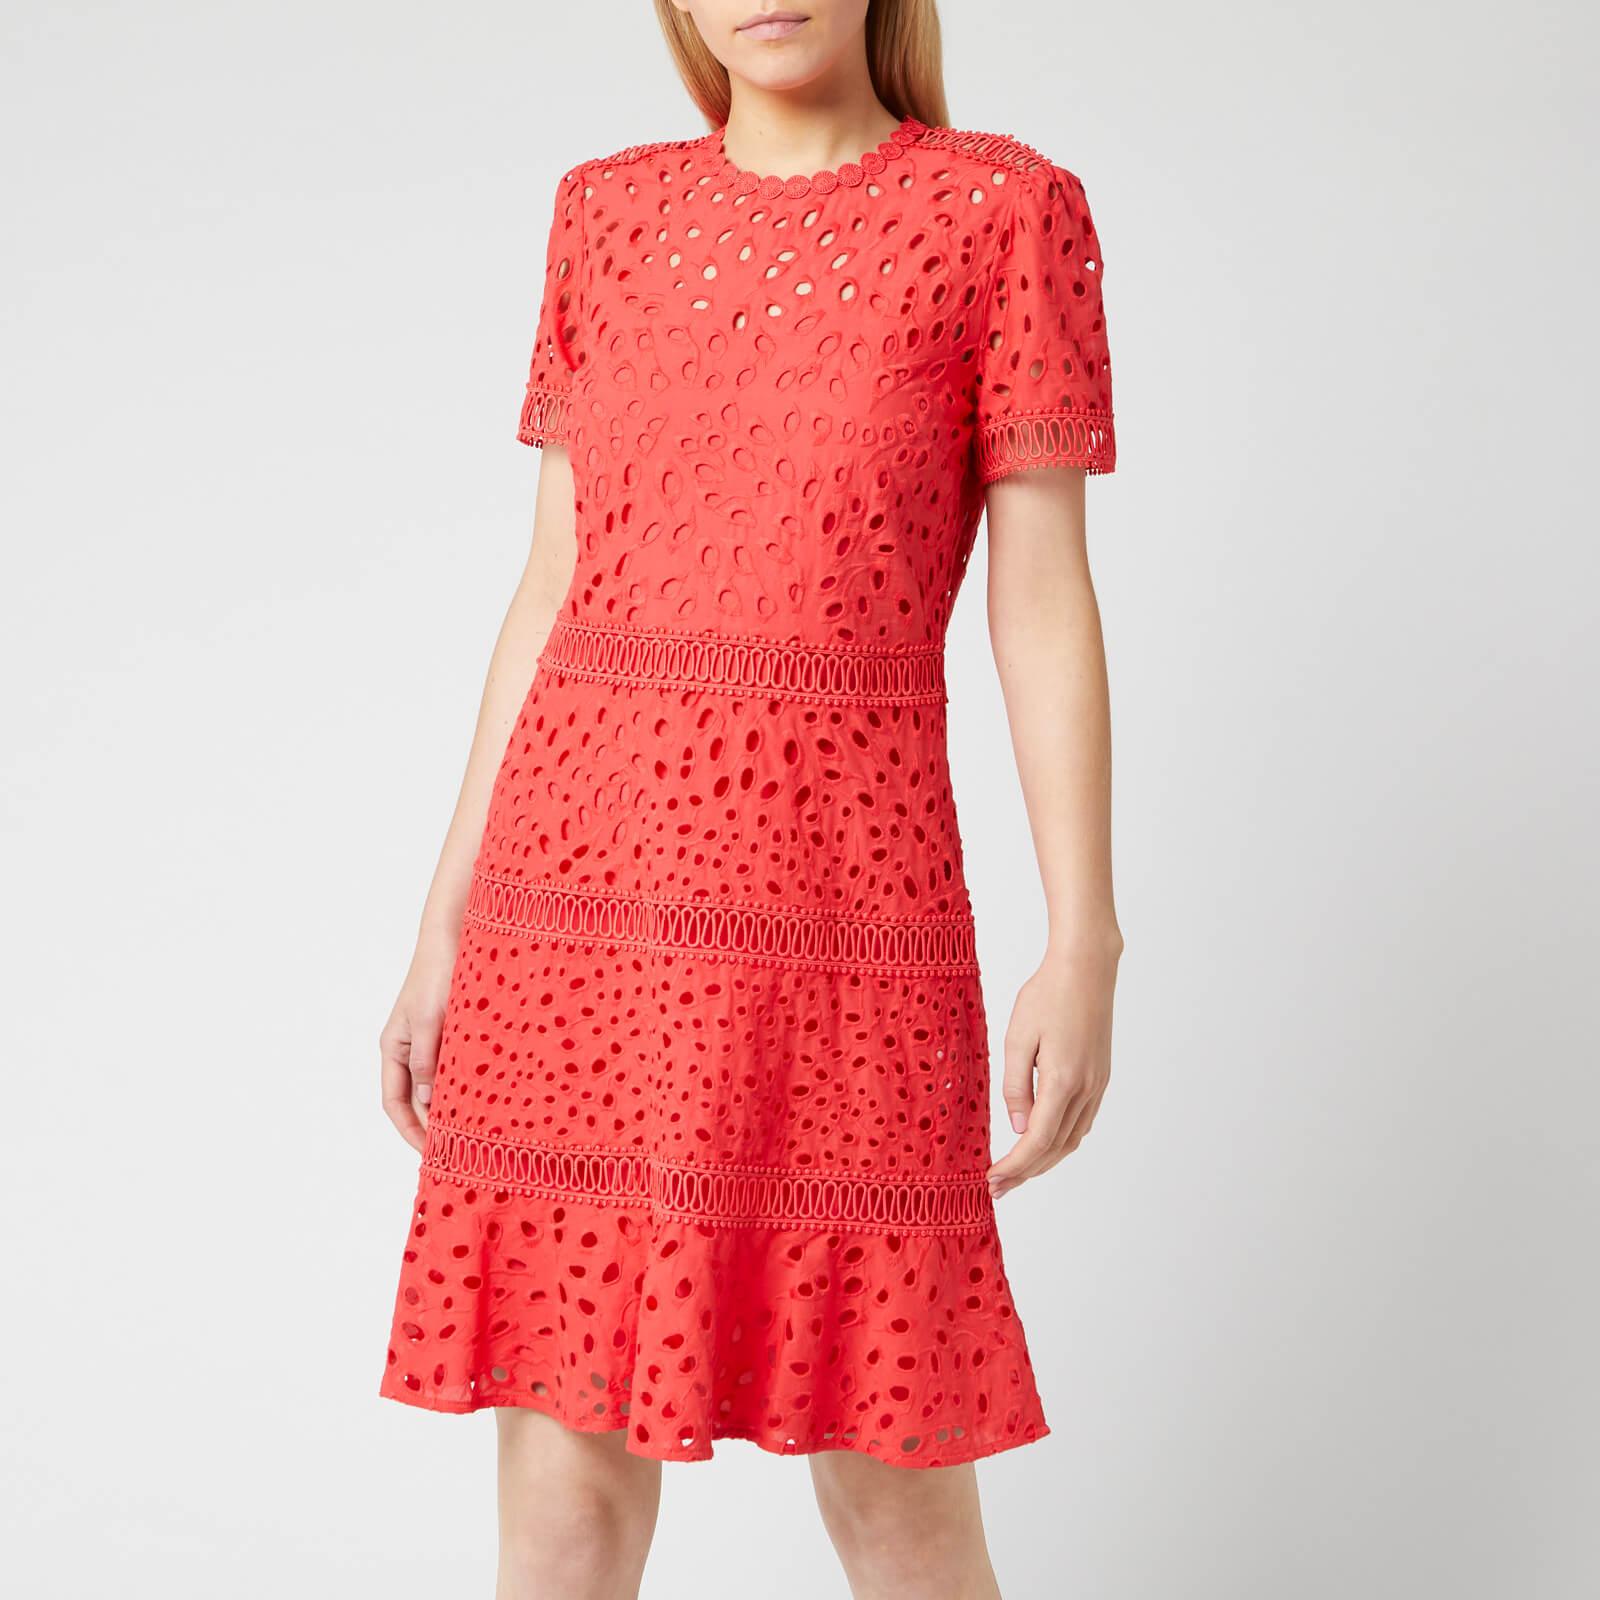 MICHAEL MICHAEL KORS Women's Eyelet Mix Dress - Sea Coral - US 6/UK 10